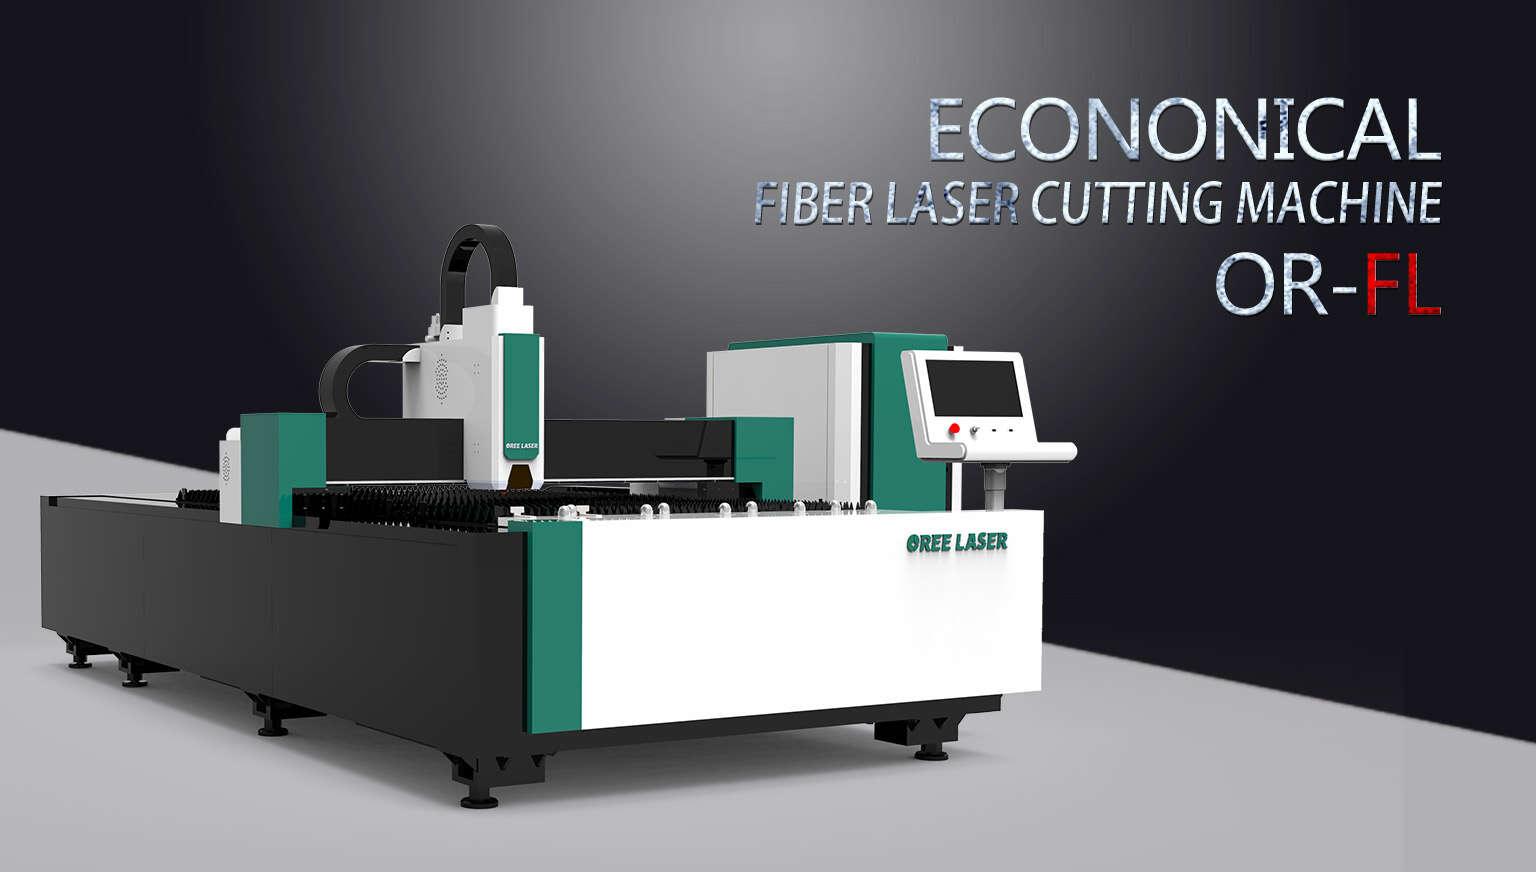 Máquina de corte láser de fibra económica OR-FL